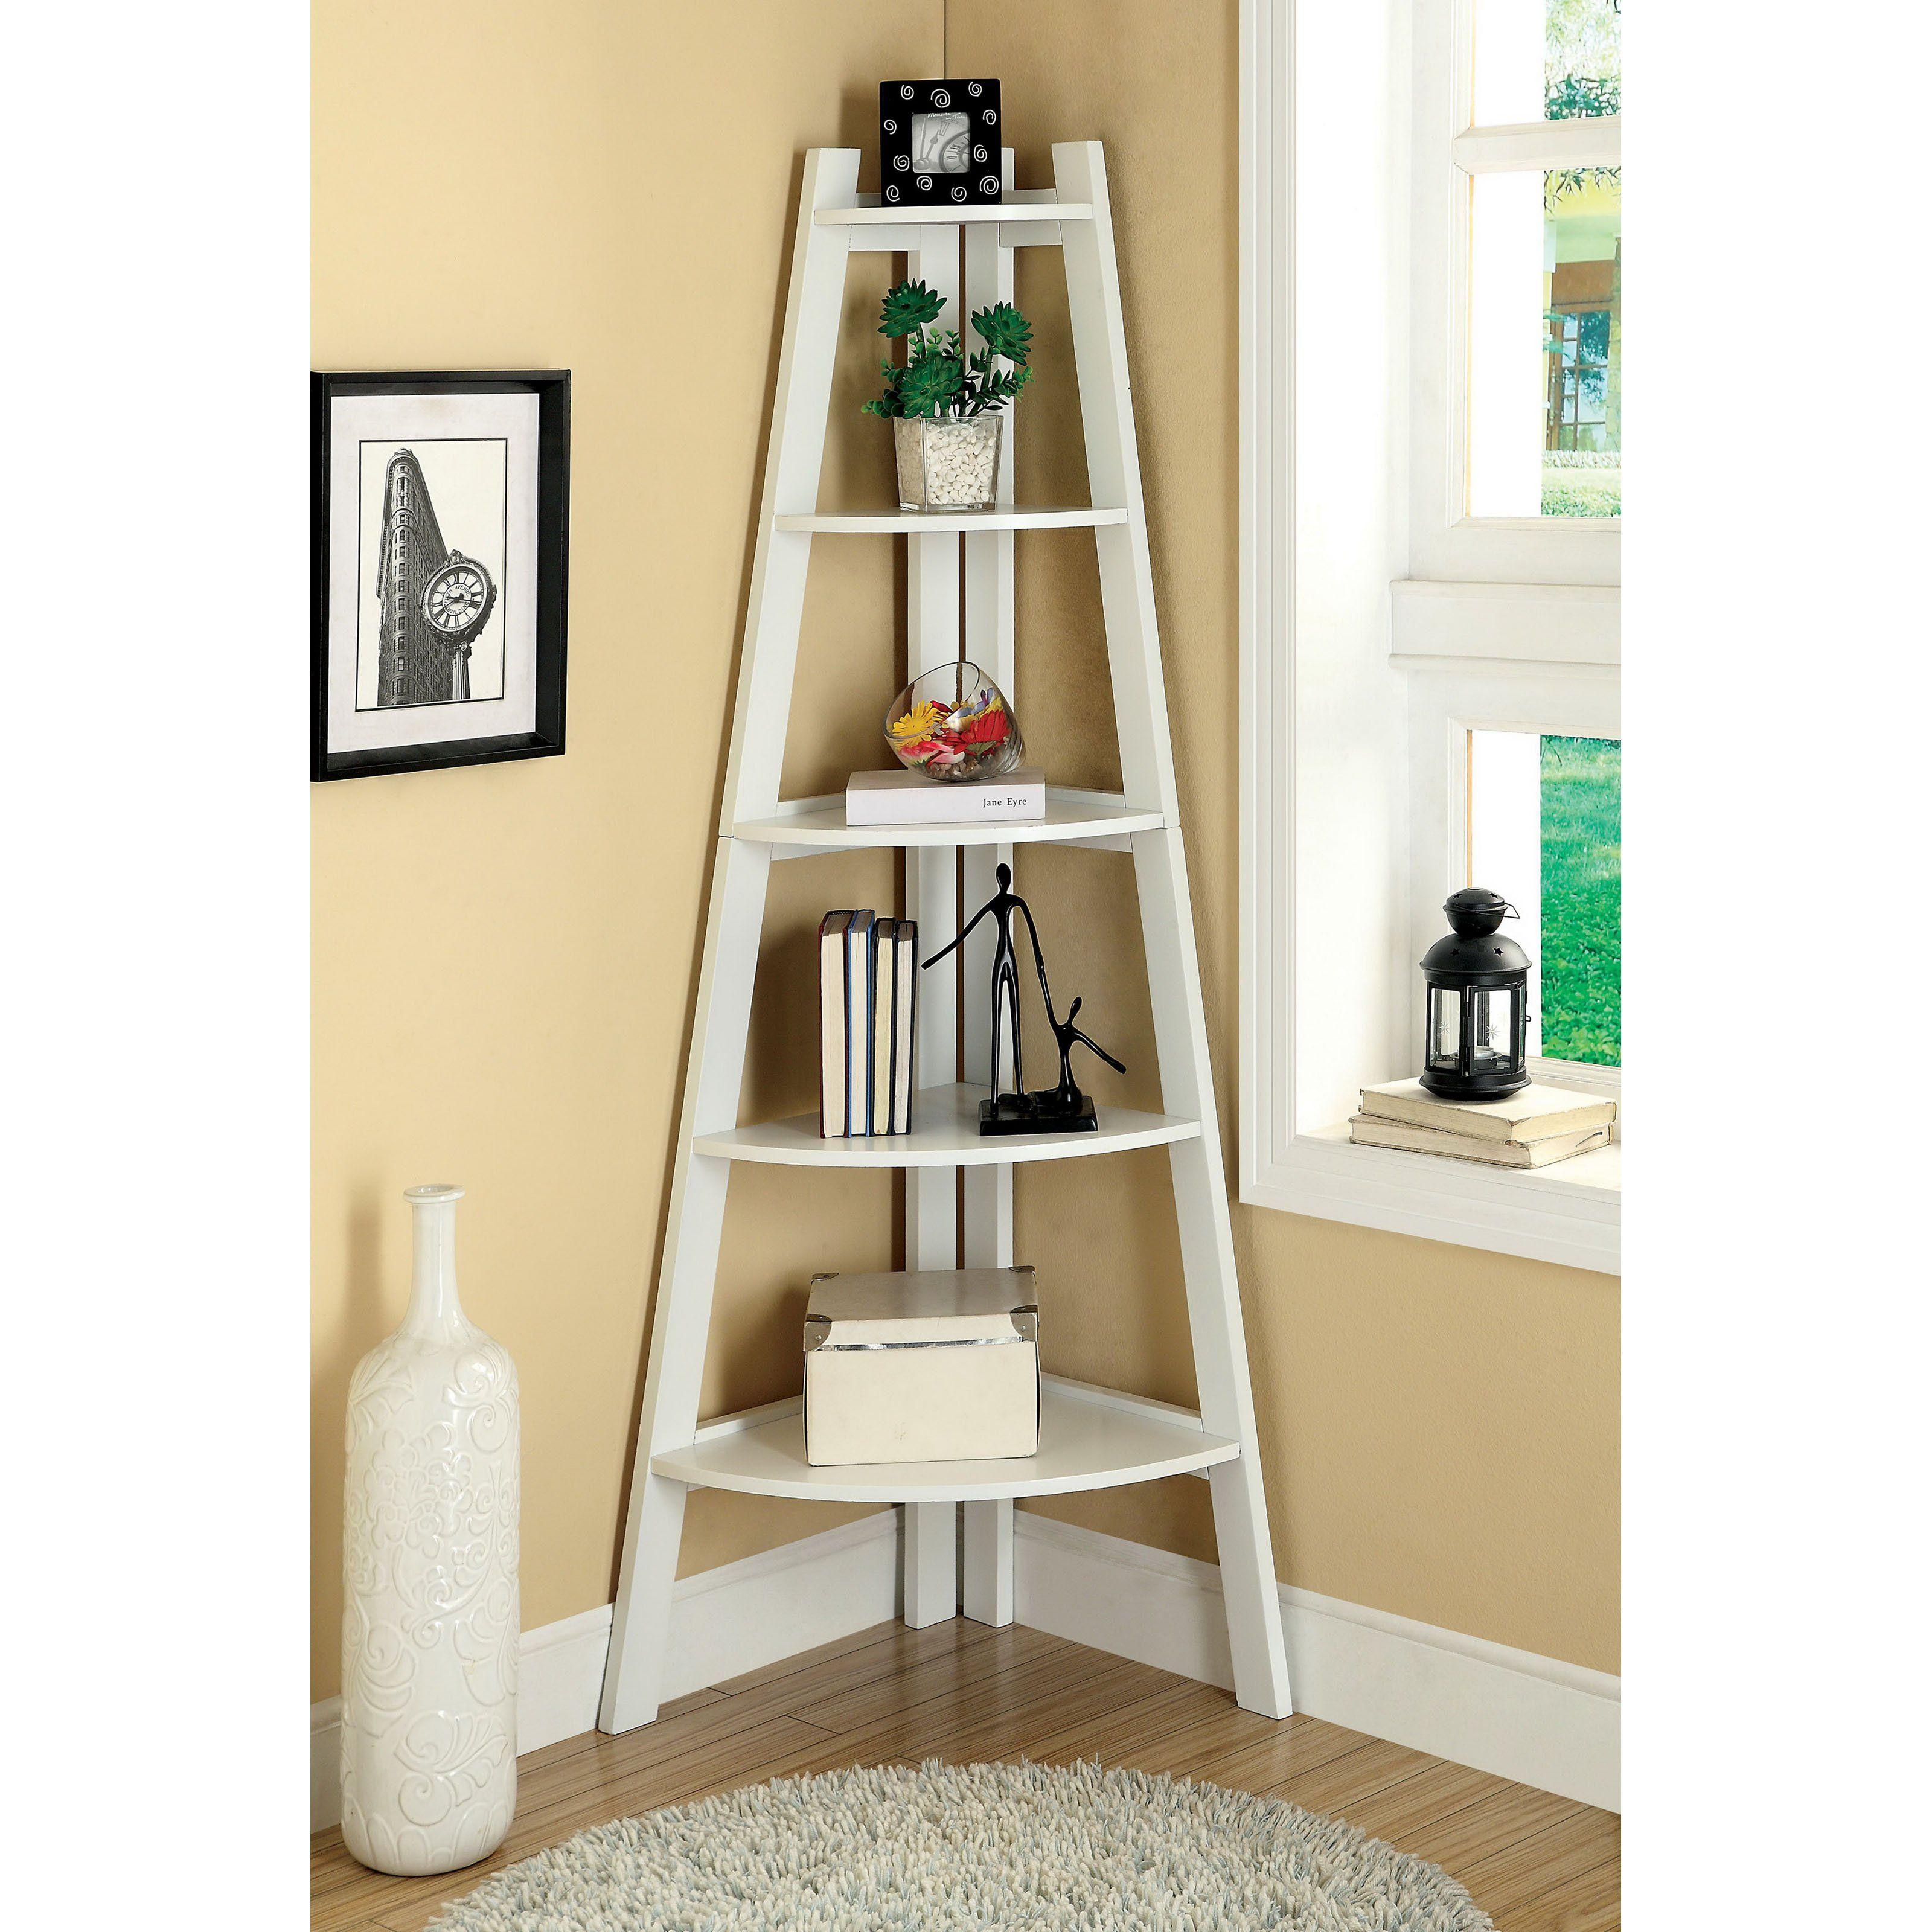 Merill tier ladder corner shelf white hayneedle